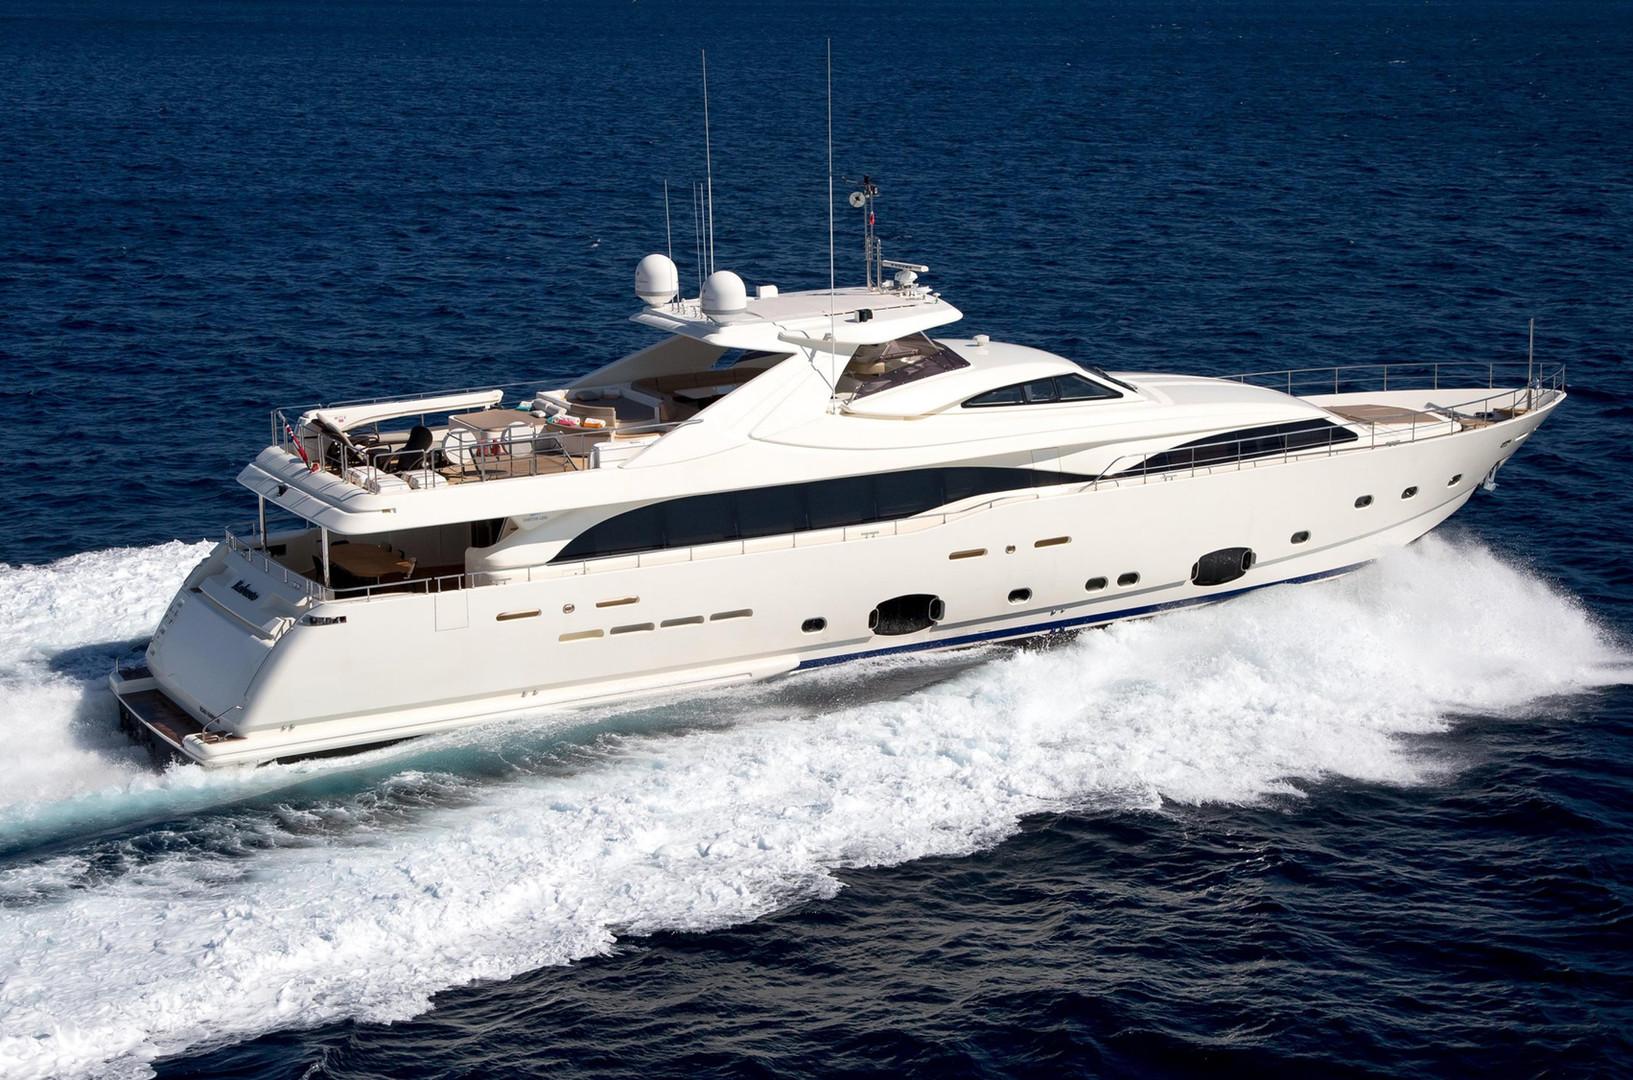 Charter Yacht ROBUSTO, cruising along the coastline